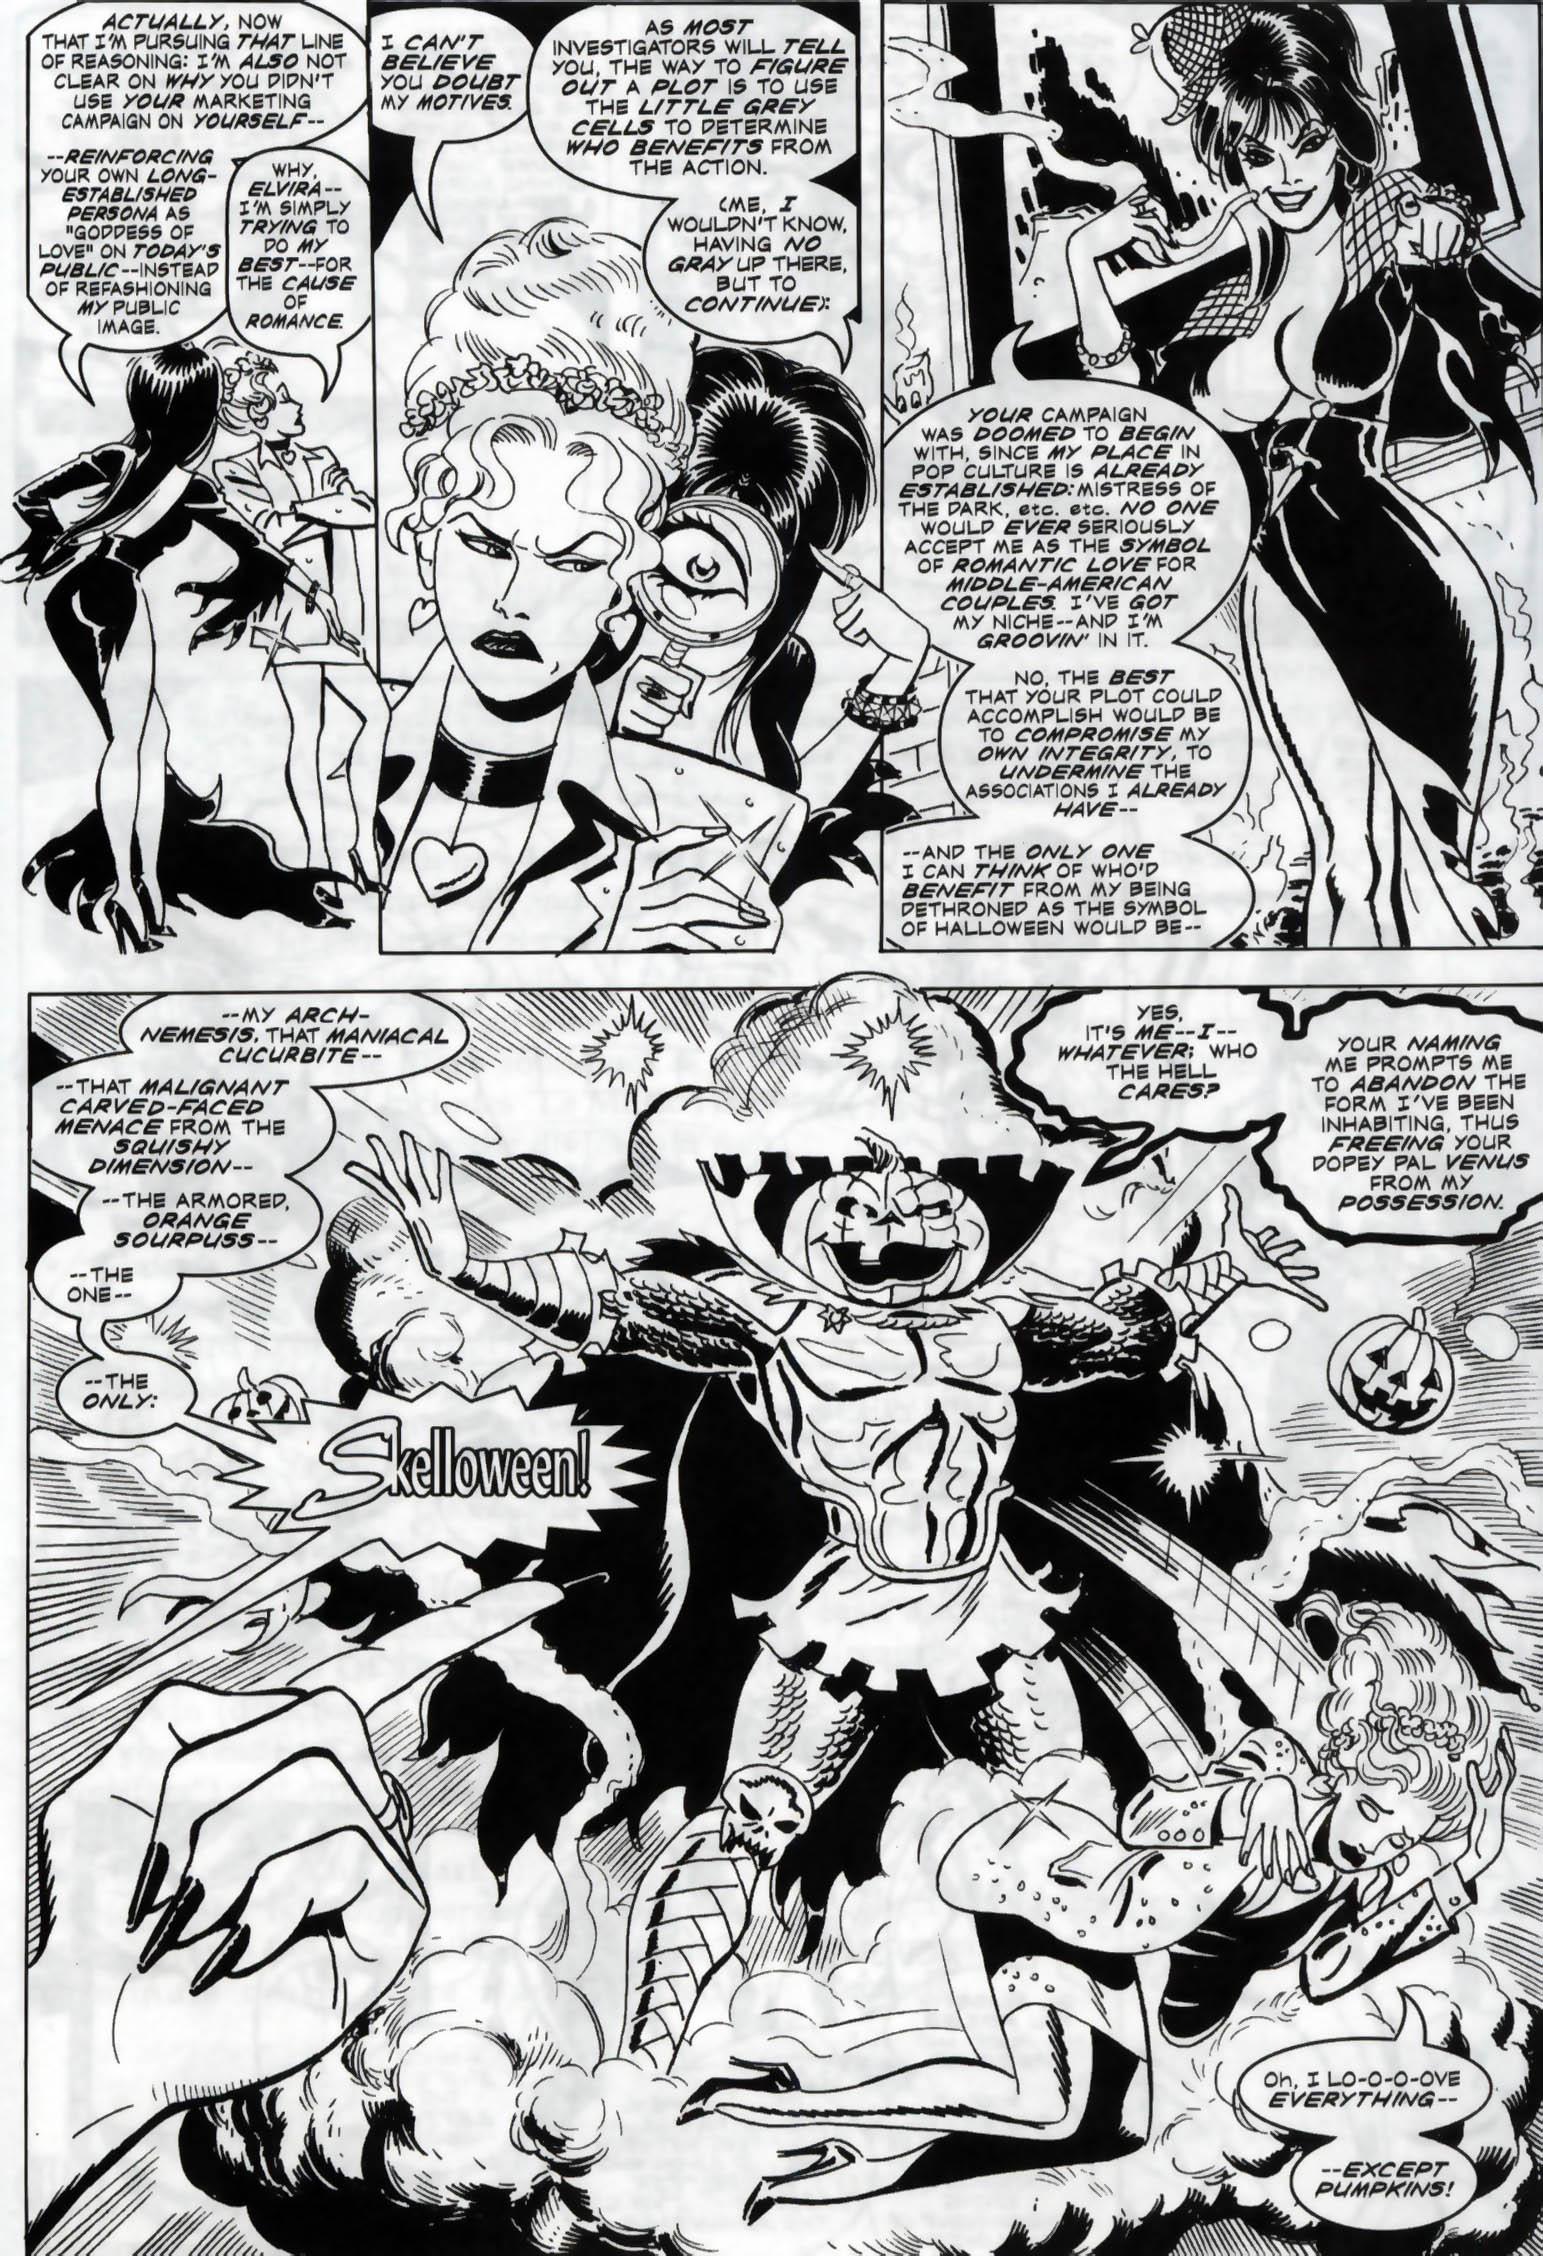 Read online Elvira, Mistress of the Dark comic -  Issue #119 - 24